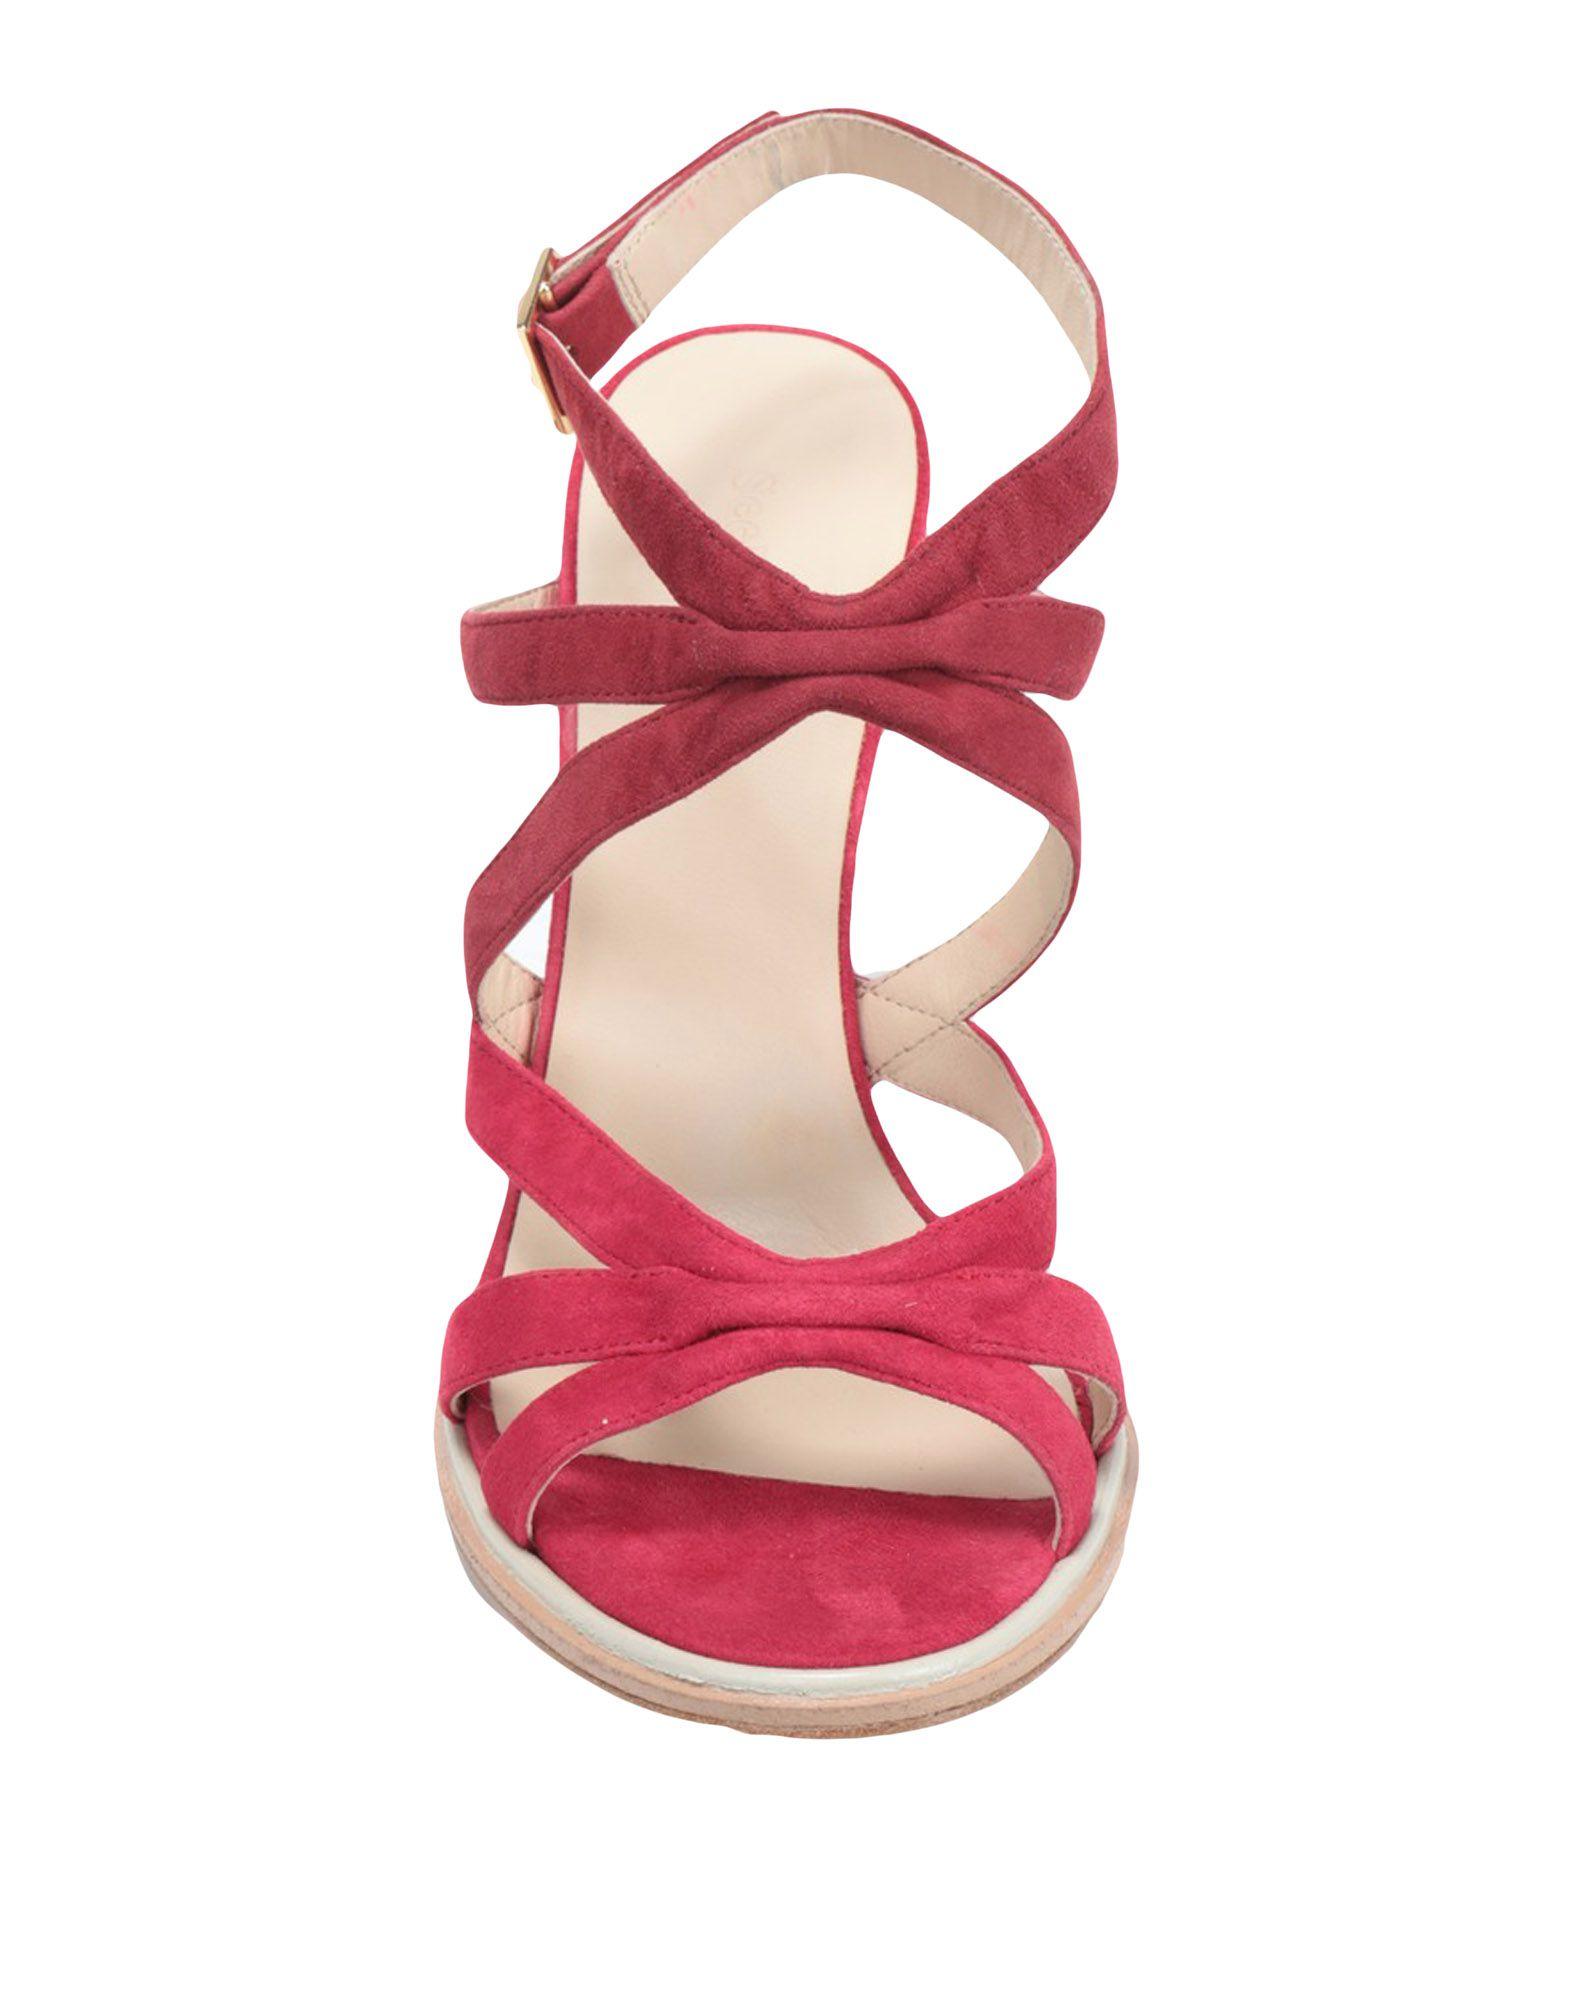 Stilvolle billige Schuhe Damen See By Chloé Sandalen Damen Schuhe  44936657ME 843e7e